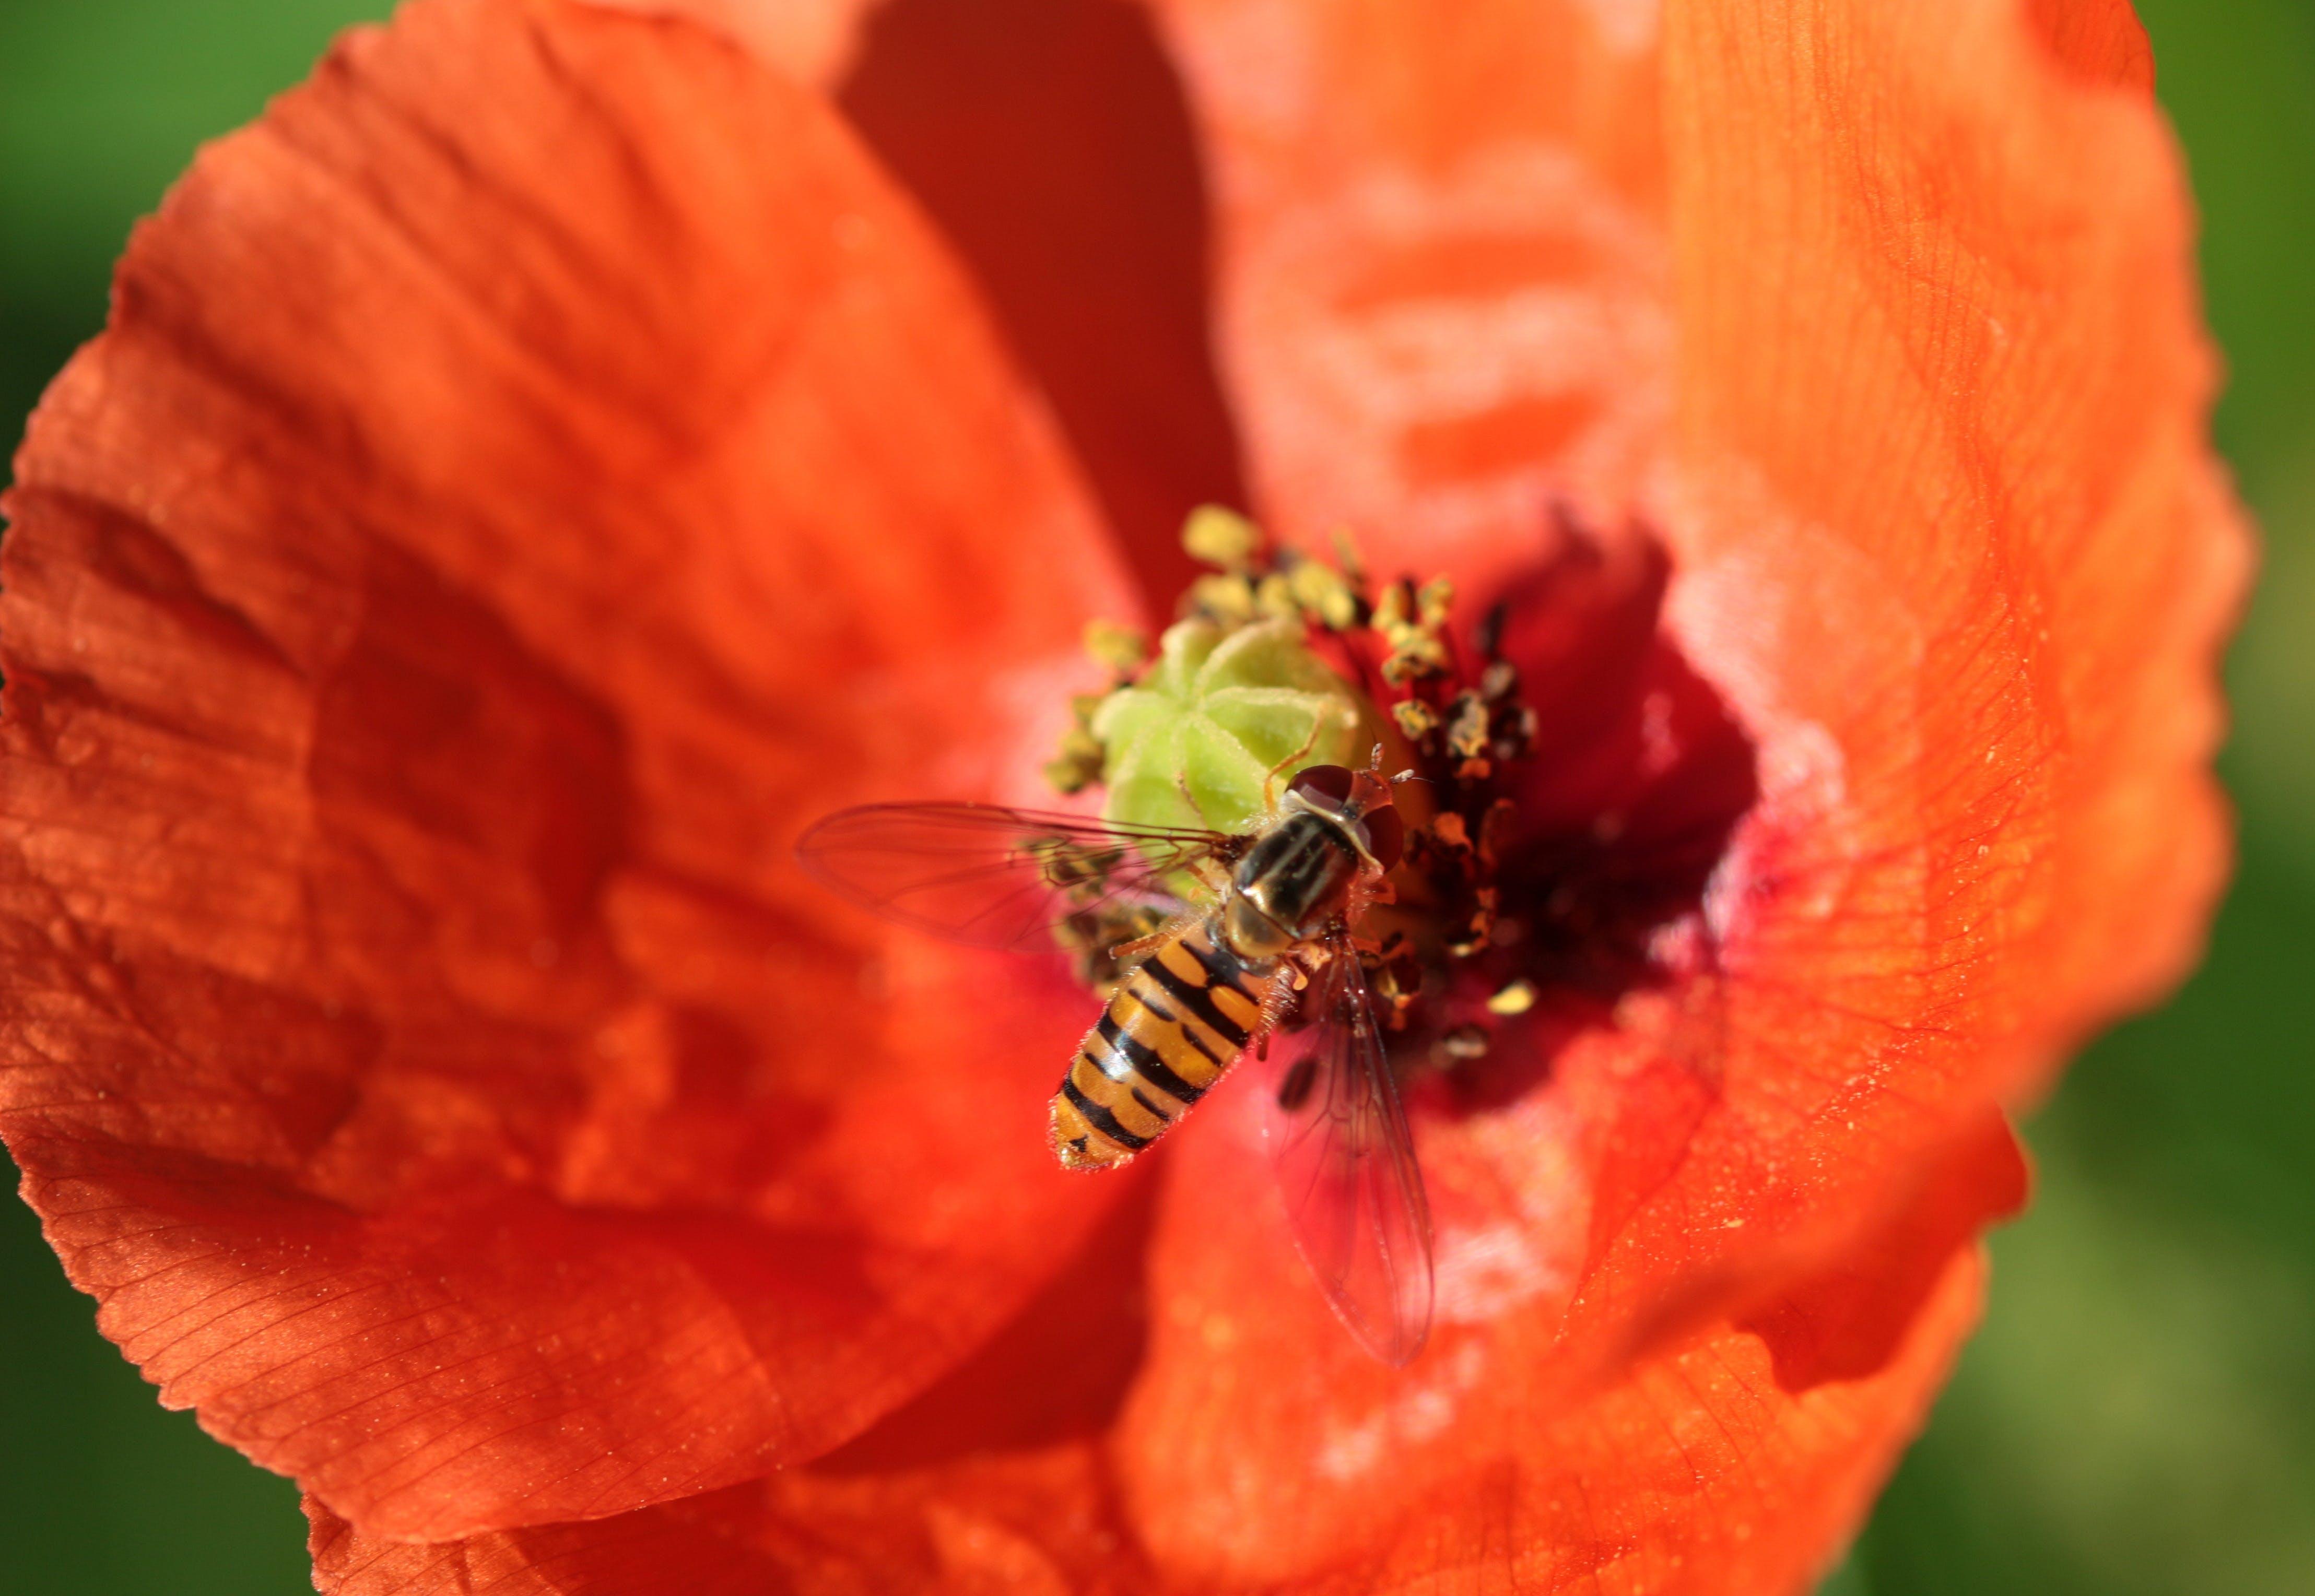 Free stock photo of house feldwespe, klatschmohn, nectar, nectar search